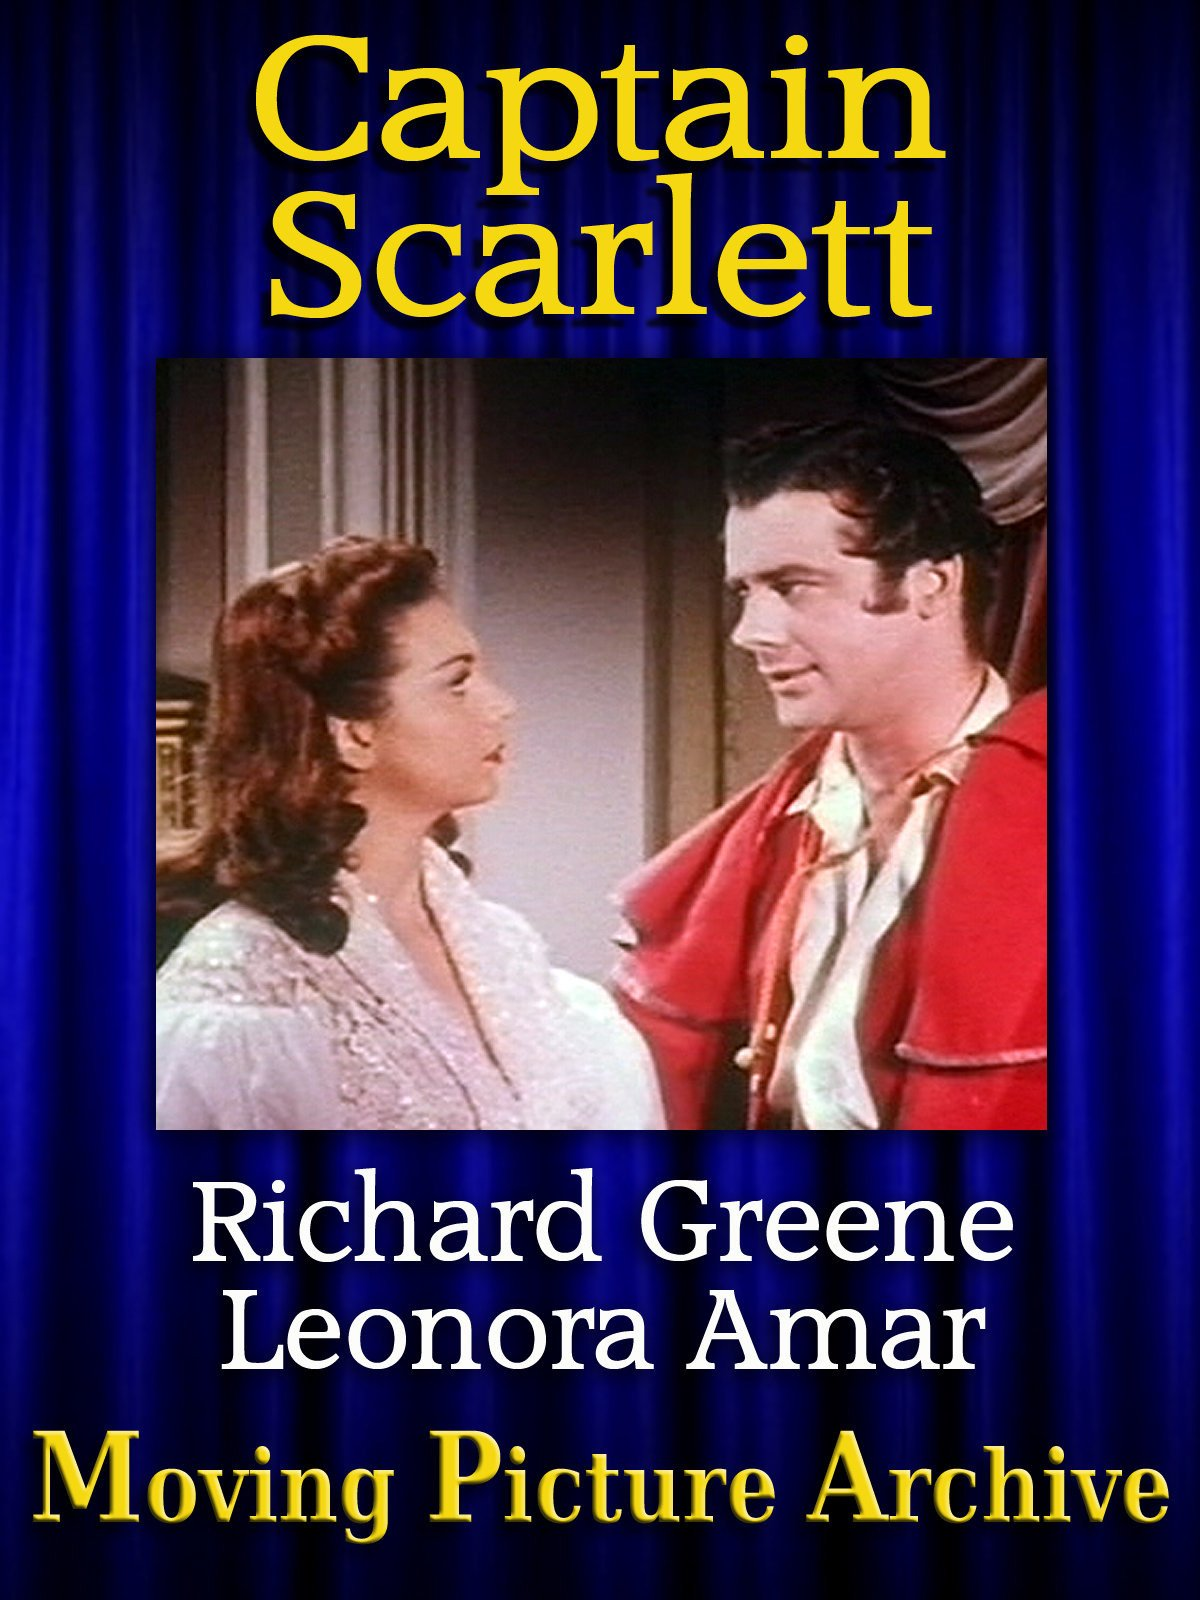 Captain Scarlett - Color - 1953